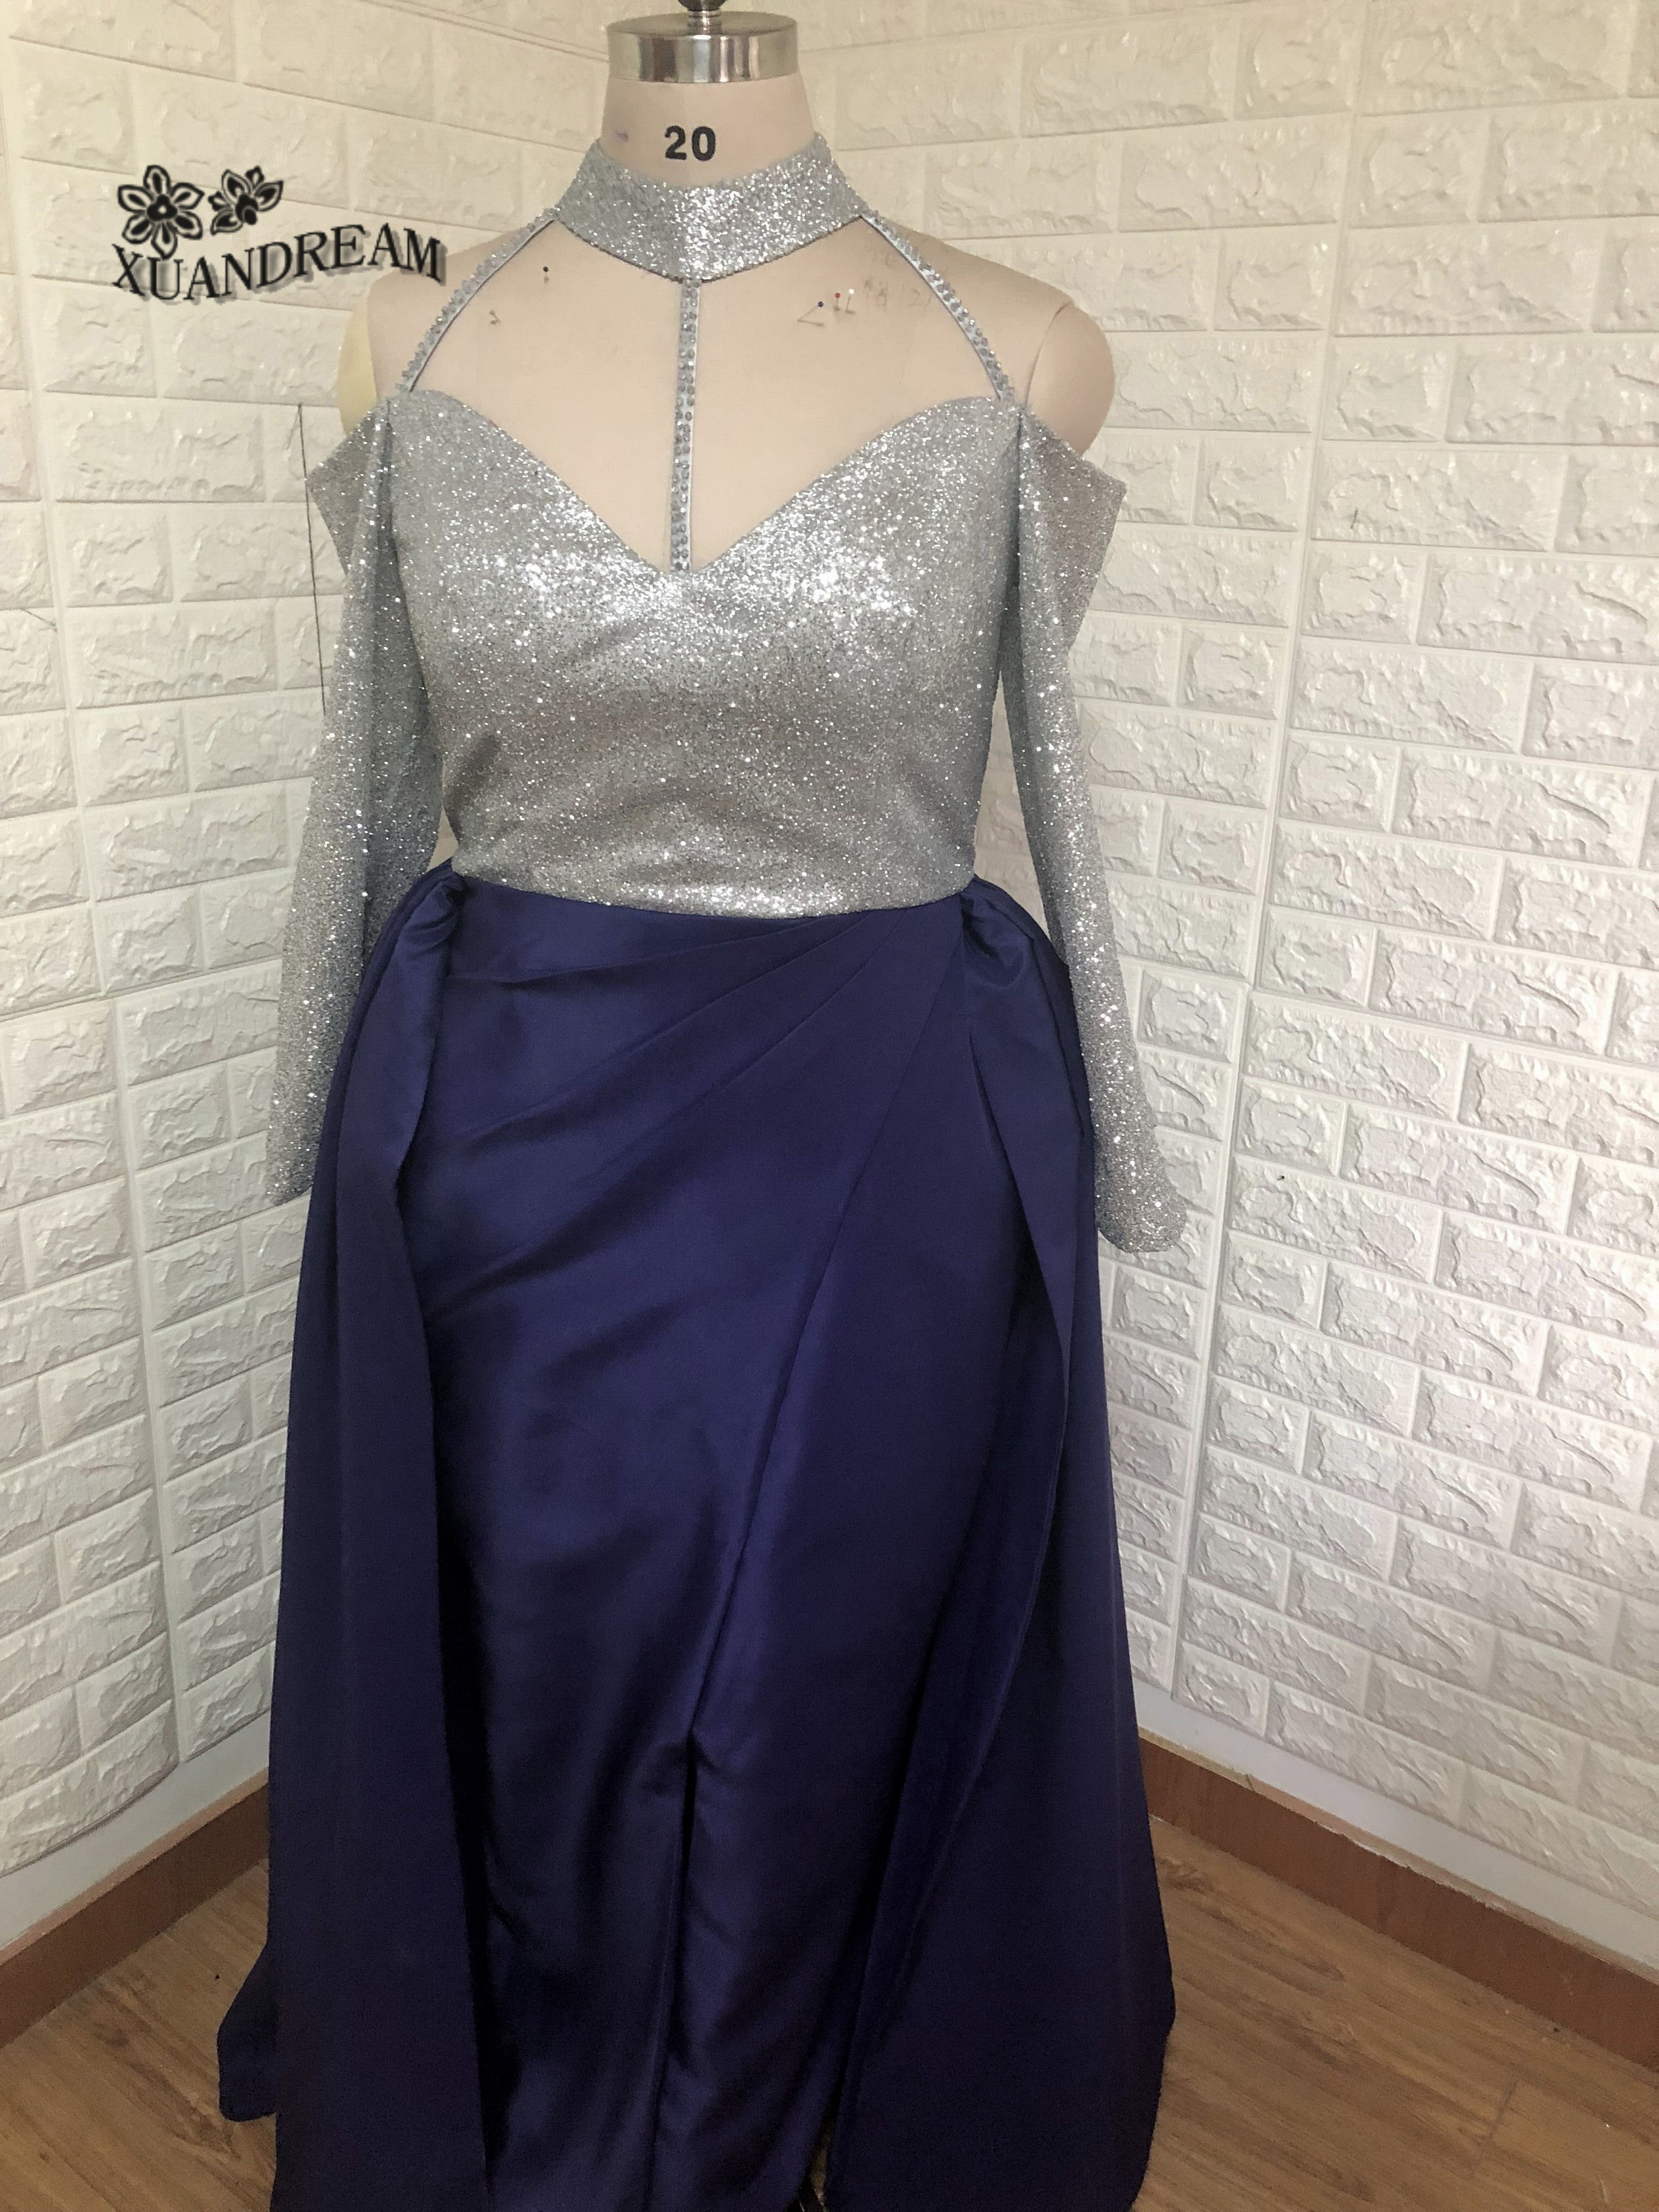 Cerimonia Vestiti.Hot Sale Plus Size Women Dress Vestiti Cerimonia Donna Robe Dubai